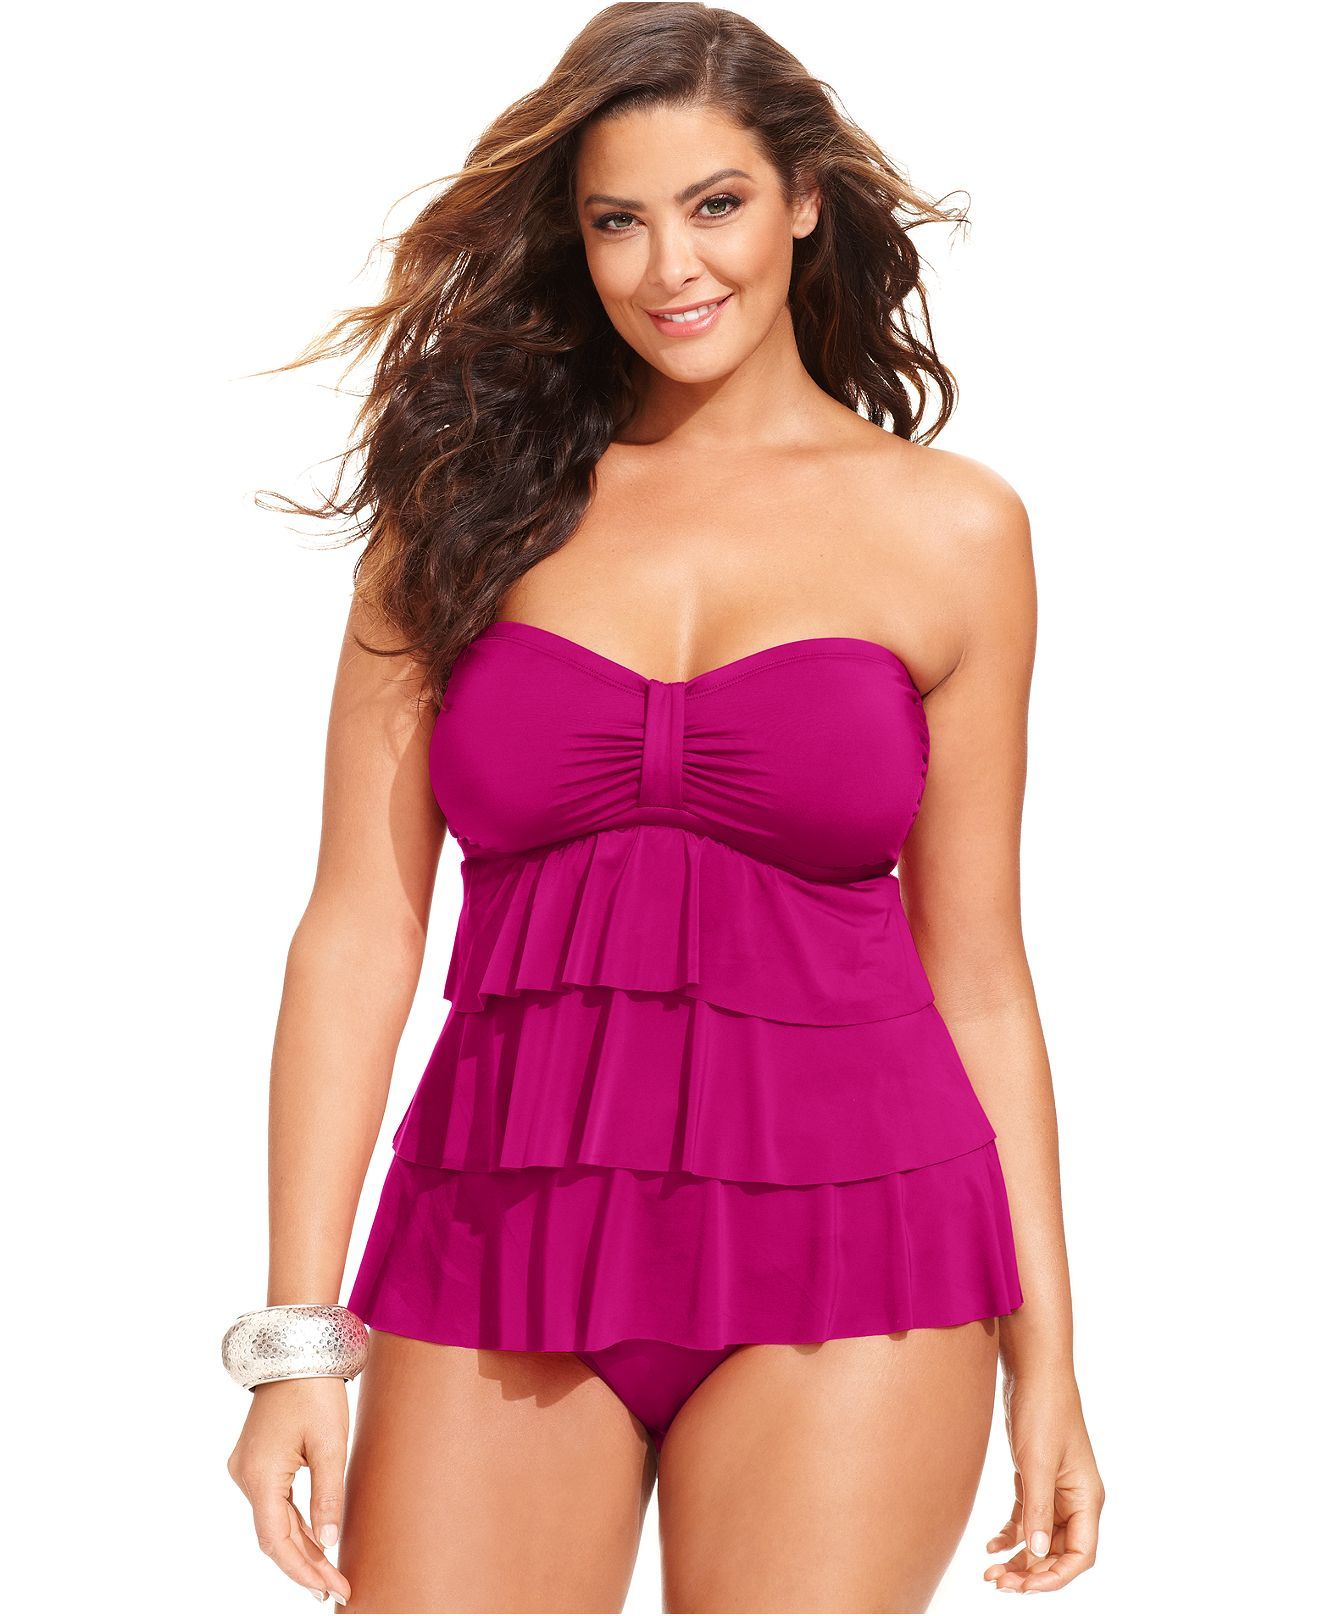 cc69b0bbe64 Kenneth Cole Reaction Plus Size Tiered Tankini Top & Banded Hipster Bikini  Bottom - Plus Size Swimwear - Plus Sizes - Macy's